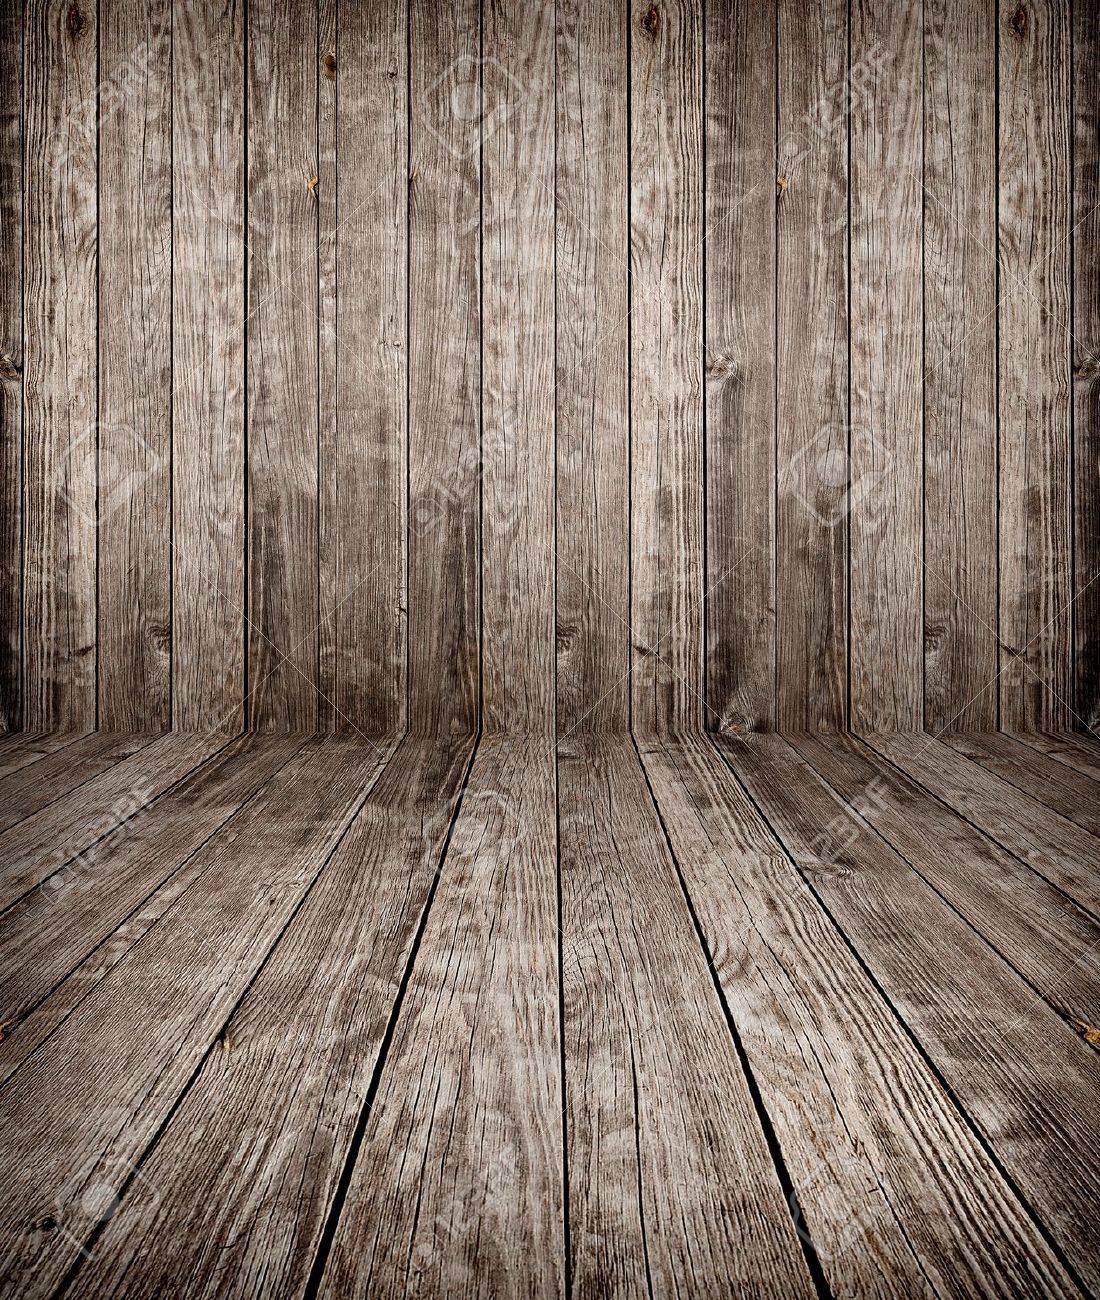 old weathered wood planks texture - 13571455